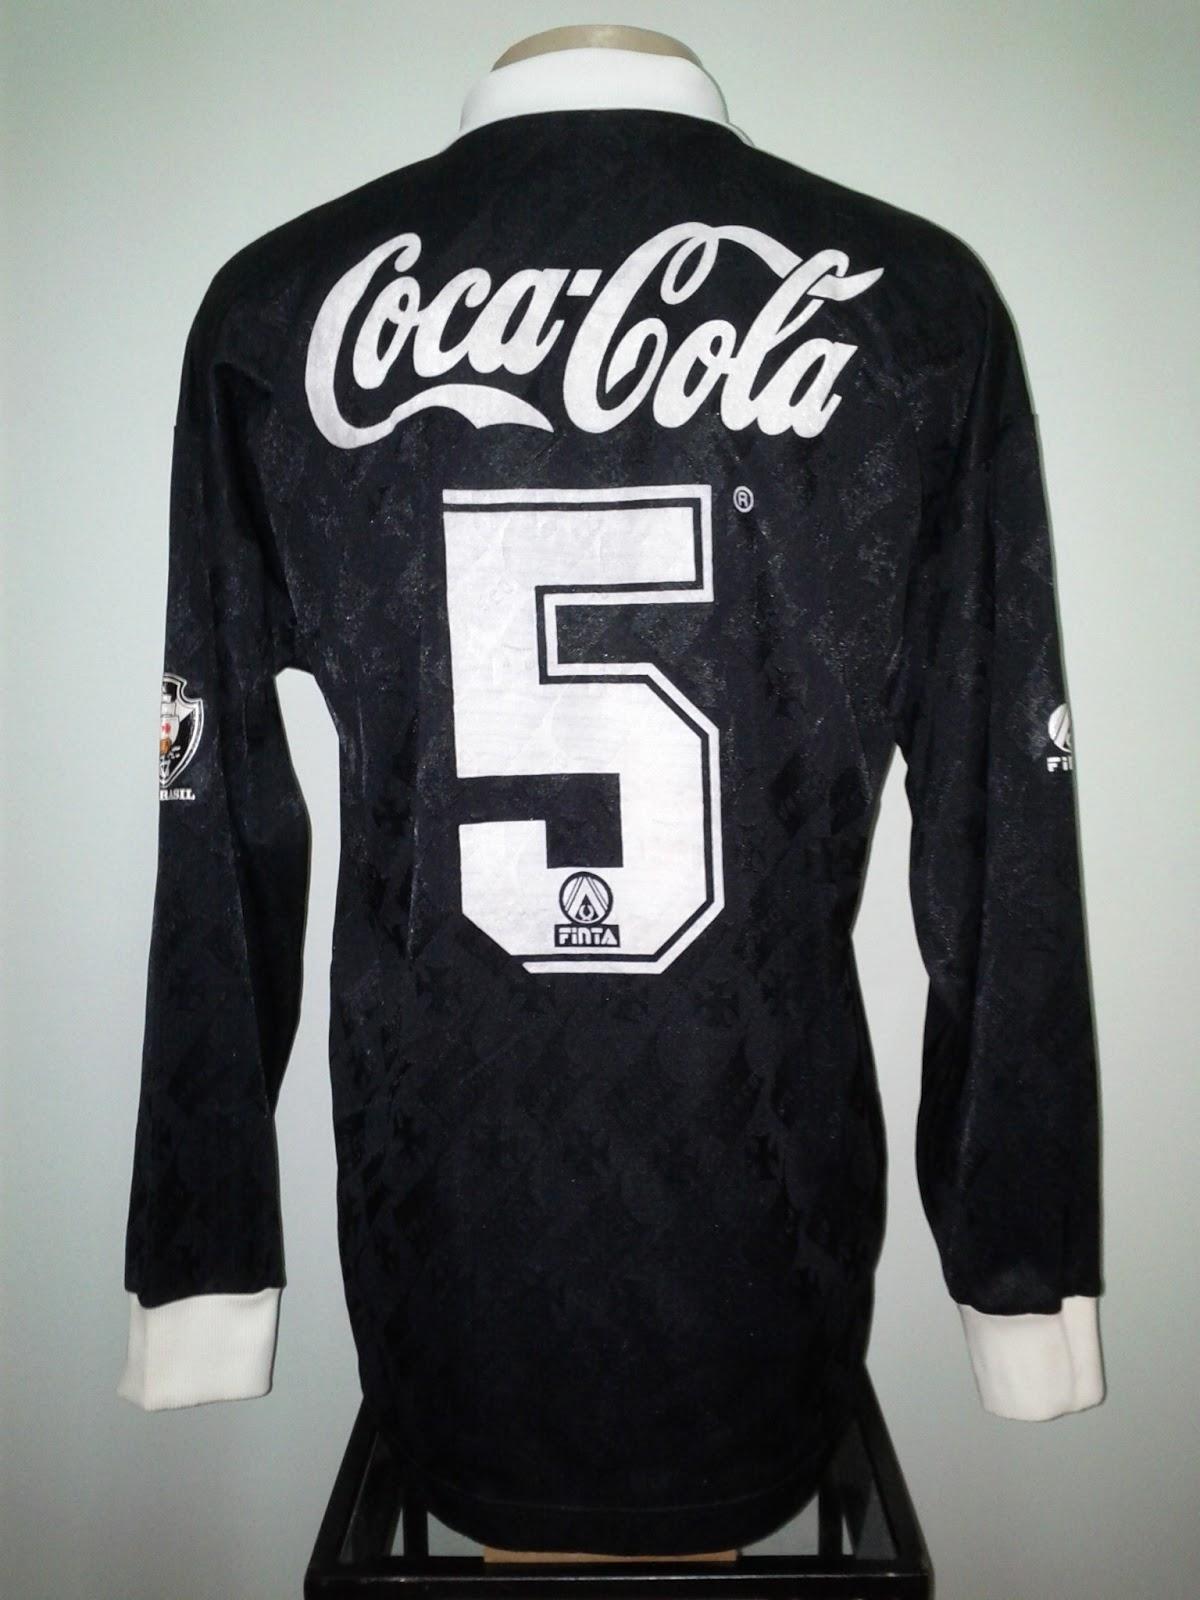 341d5004d8805 1993-94 Finta (Coca-Cola) (Valeu Roberto!) (Lousano)